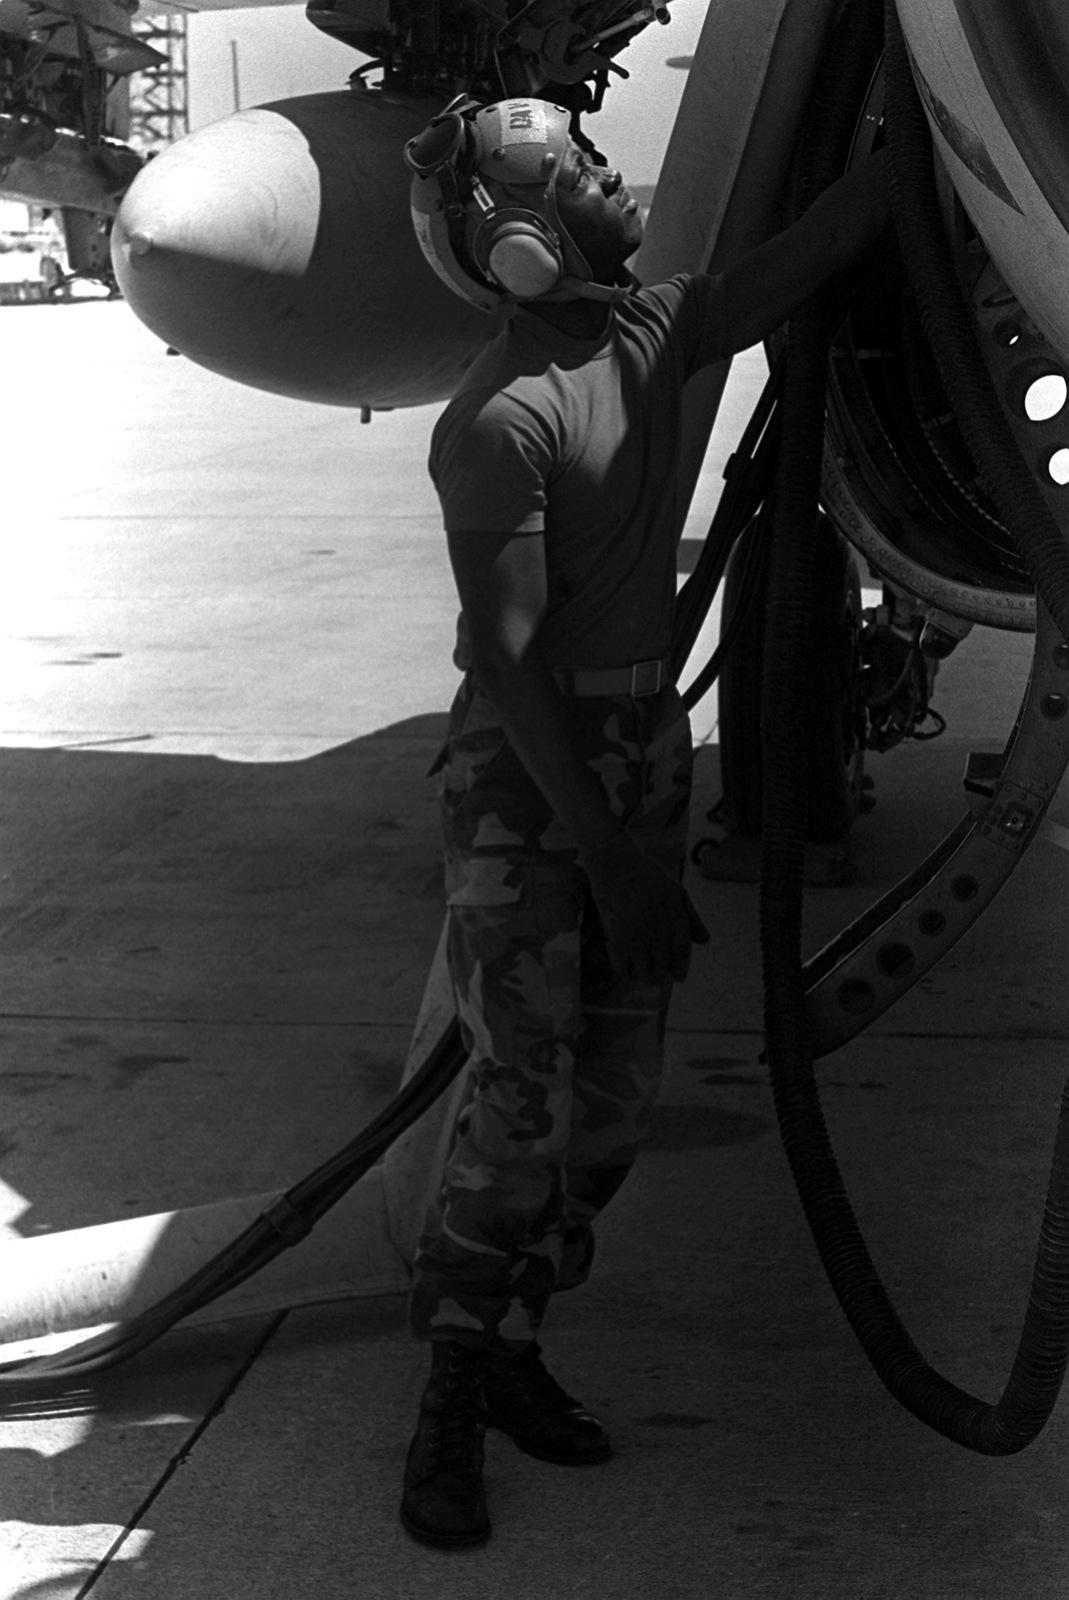 A member of Marine Attack Squadron 224 (VMA-224) services an A-6E Intruder aircraft